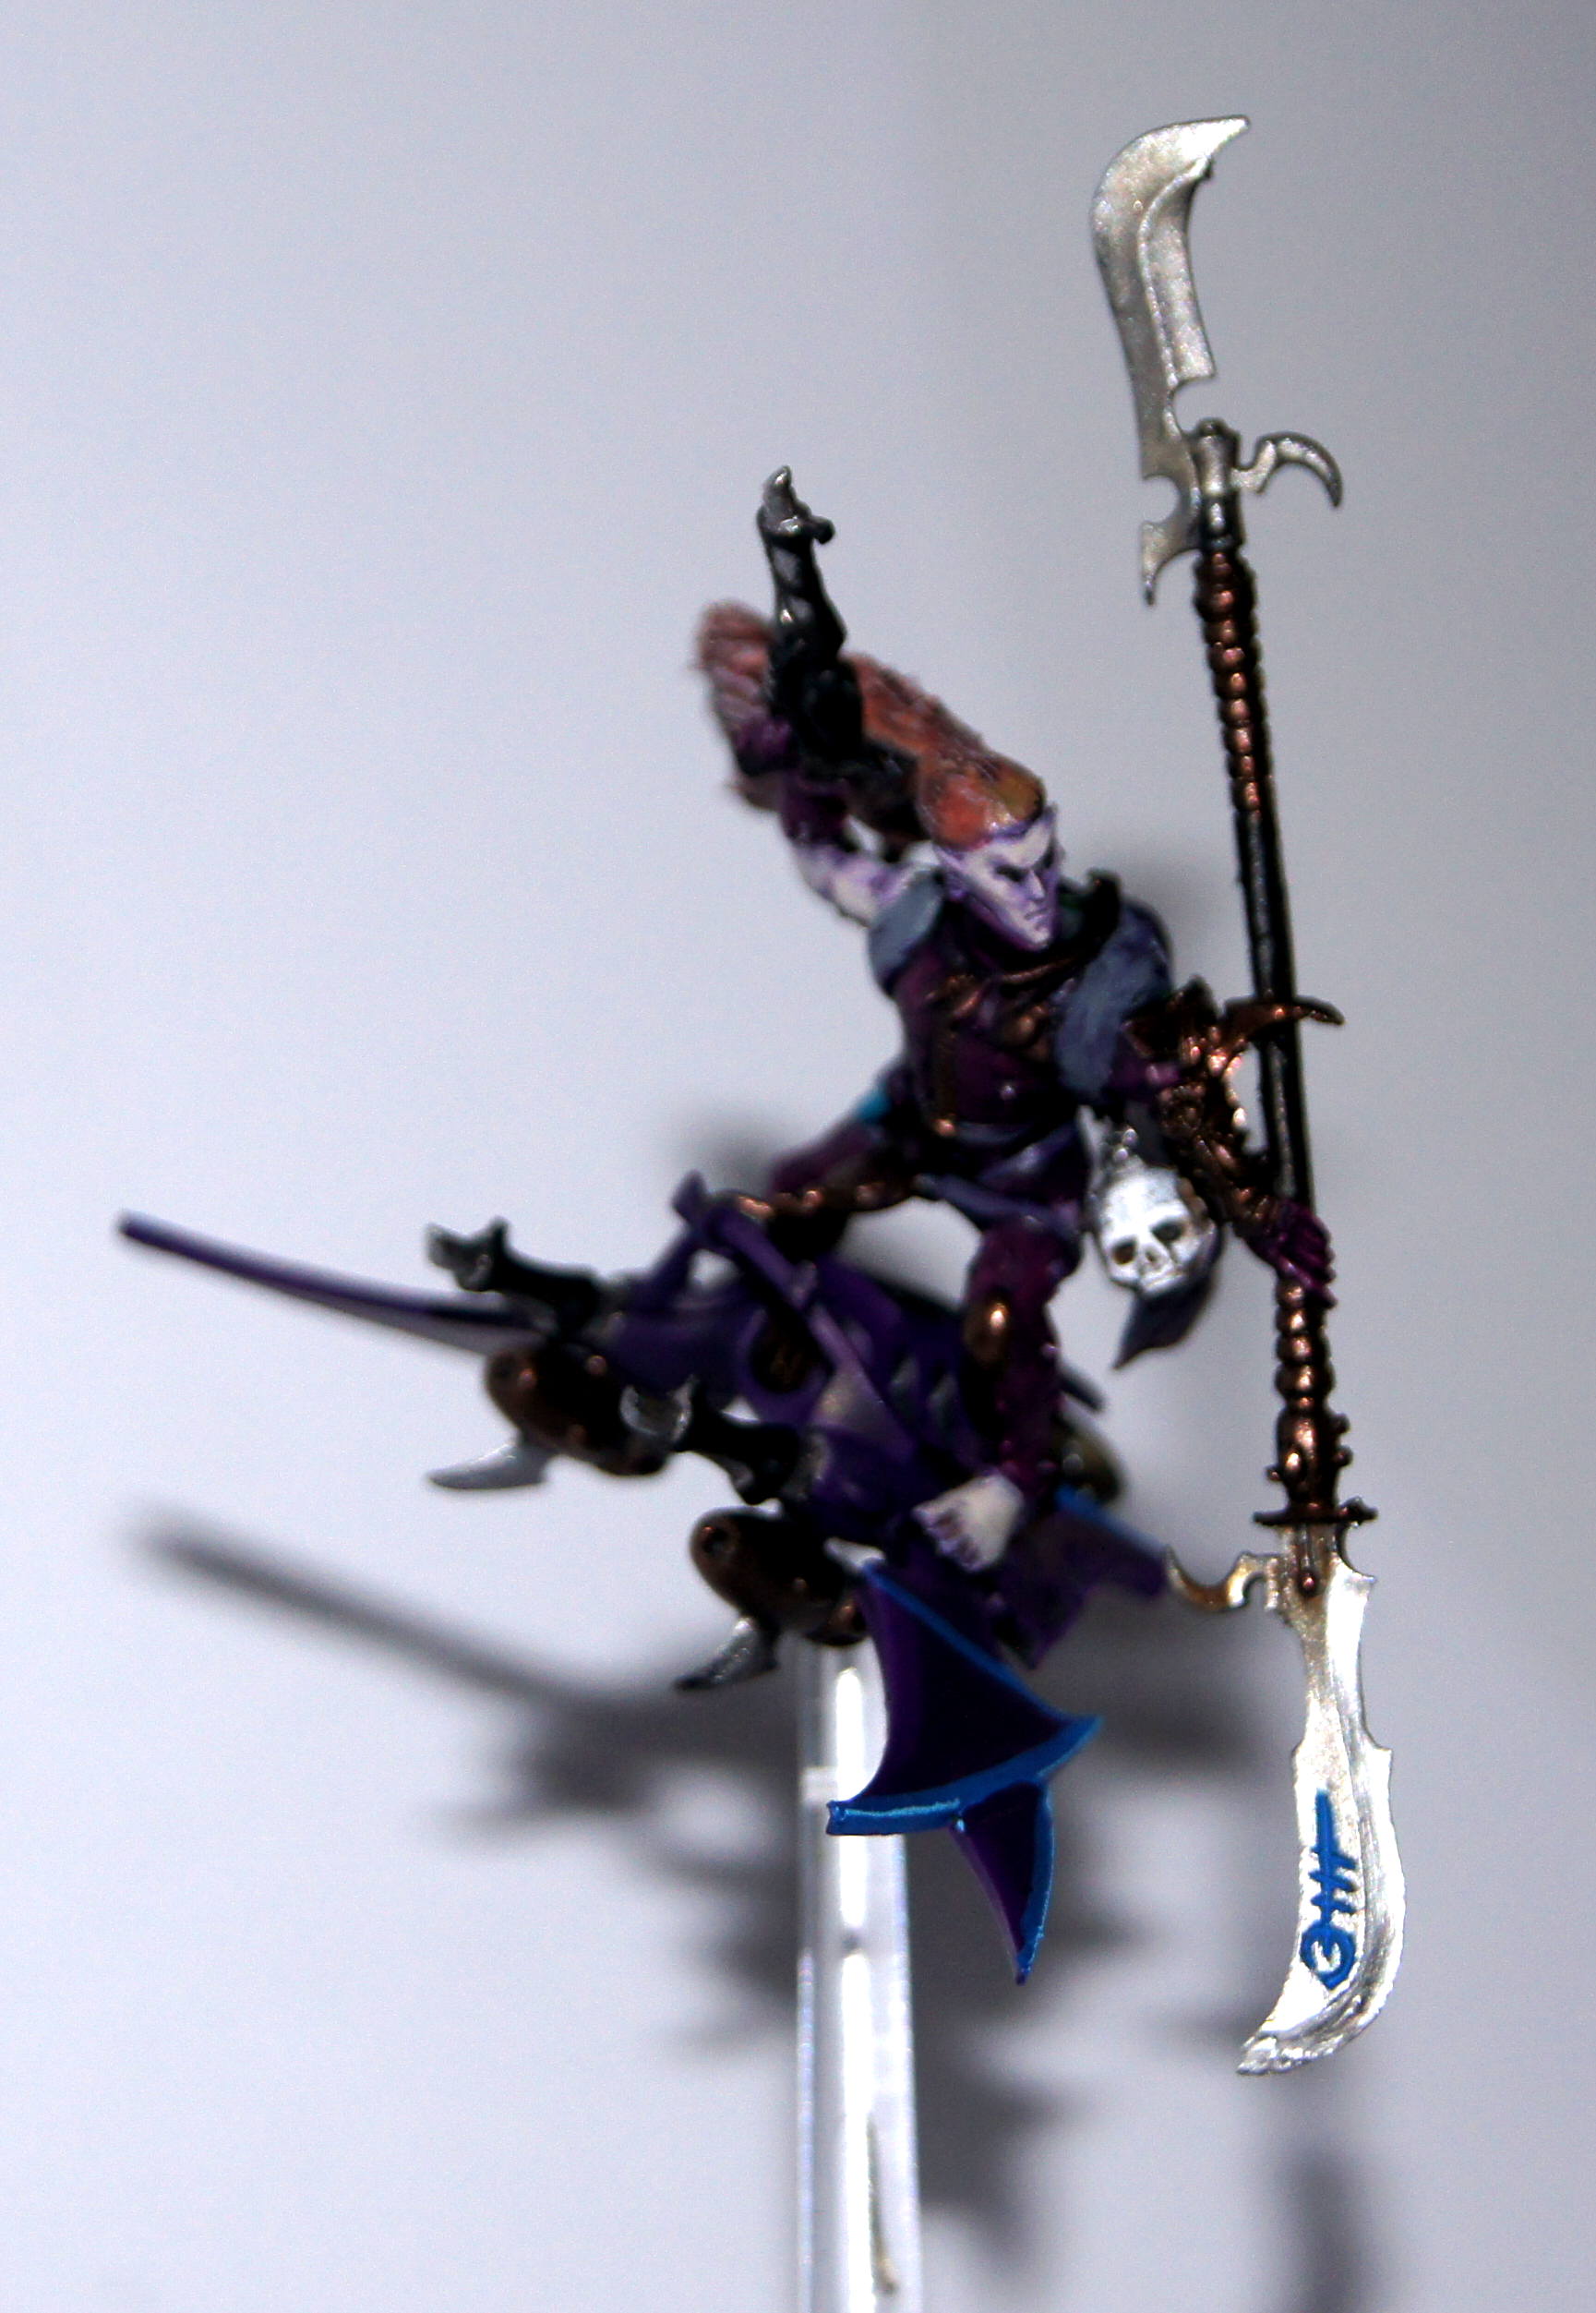 Baron, Dark, Eldar, Headquarters, Hellion, Sathonyx, Special Character